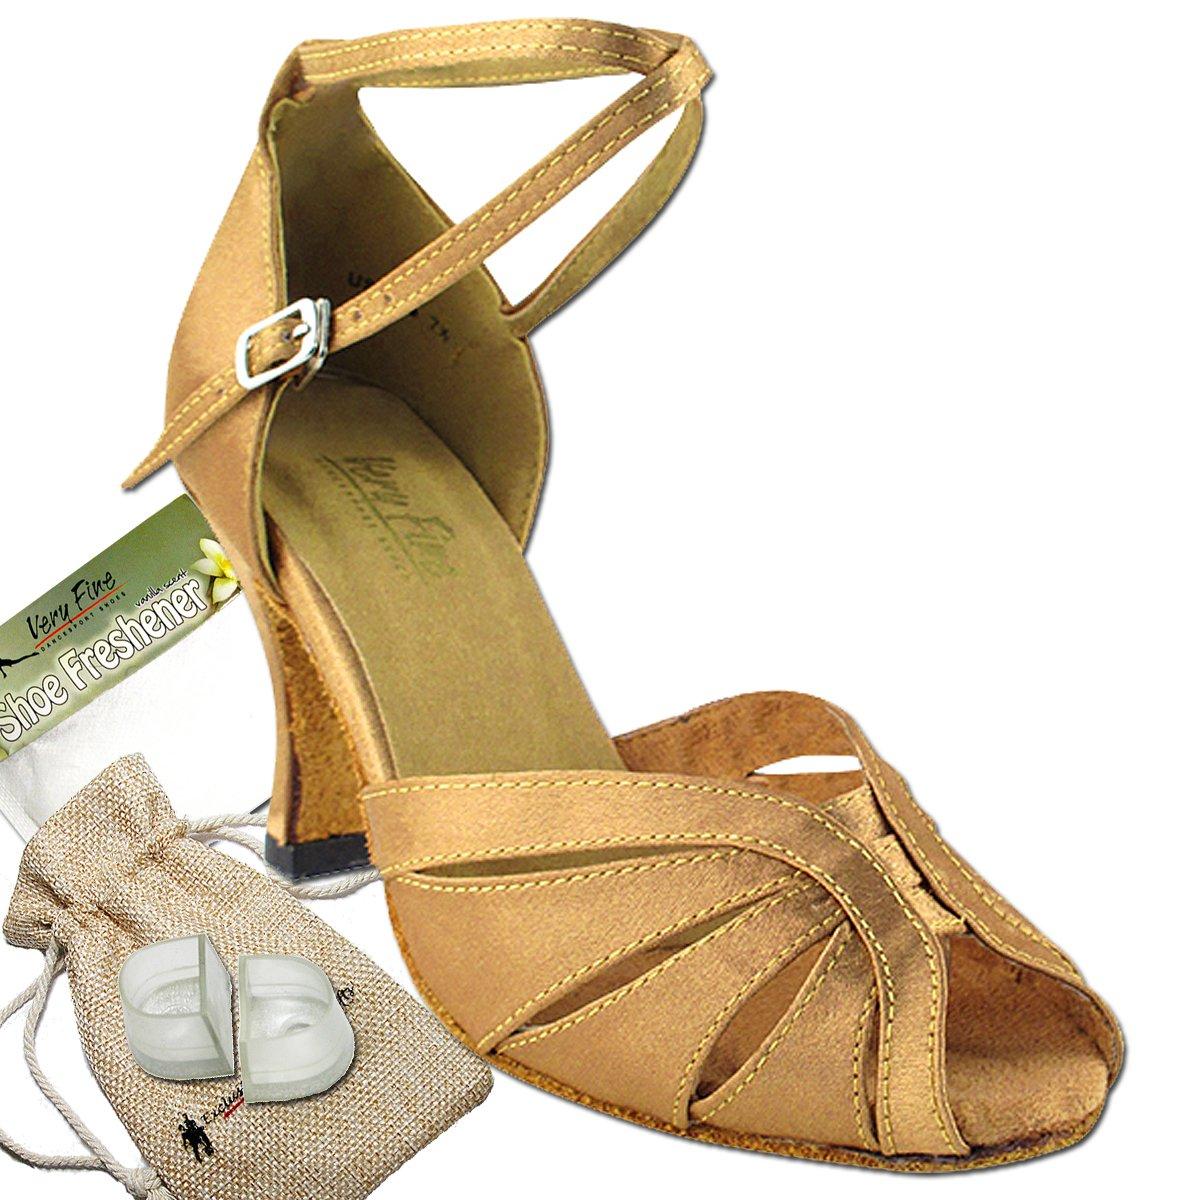 Women's Ballroom Dance Shoes Tango Wedding Salsa Dance Shoes Brown Satin 2713EB Comfortable - Very Fine 3'' Heel 5.5 M US [Bundle of 5]